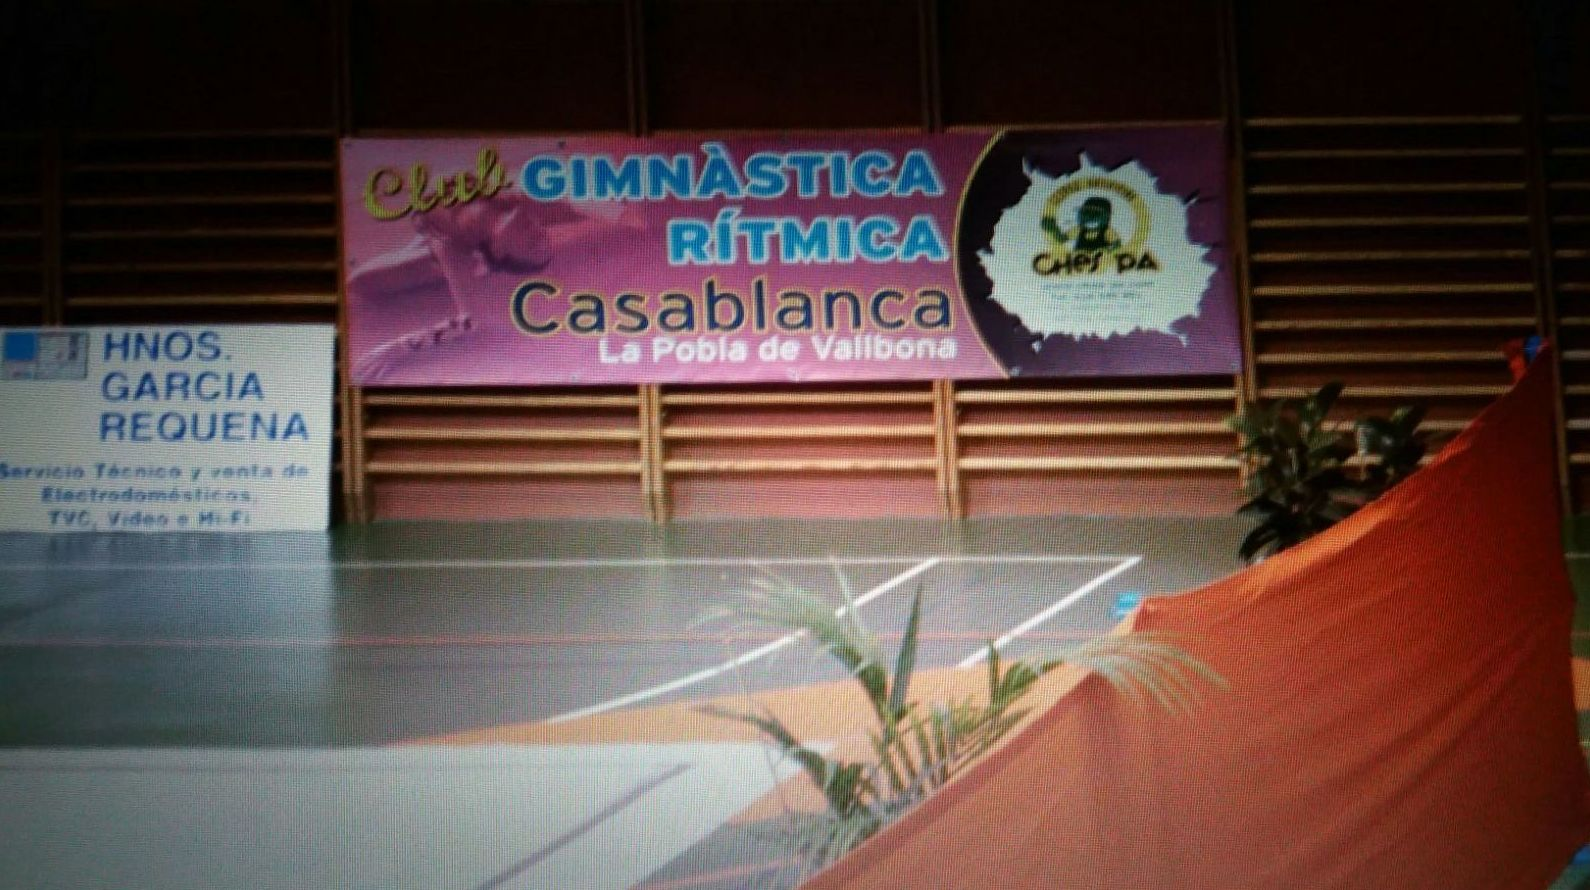 Ches Pa patrocina club gimnasia rítmica